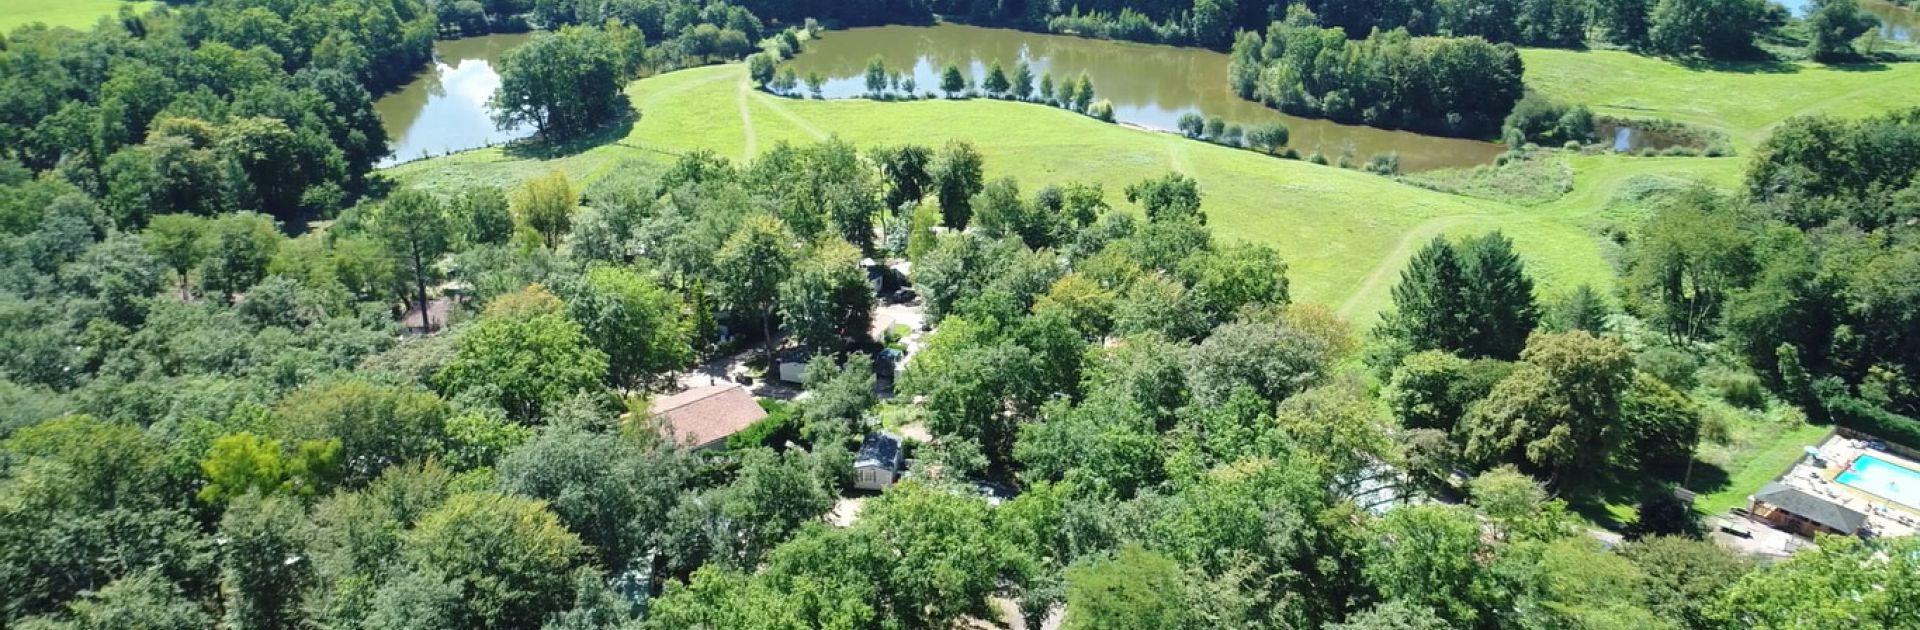 Périgord vert Dordogne parc Naturel Régional